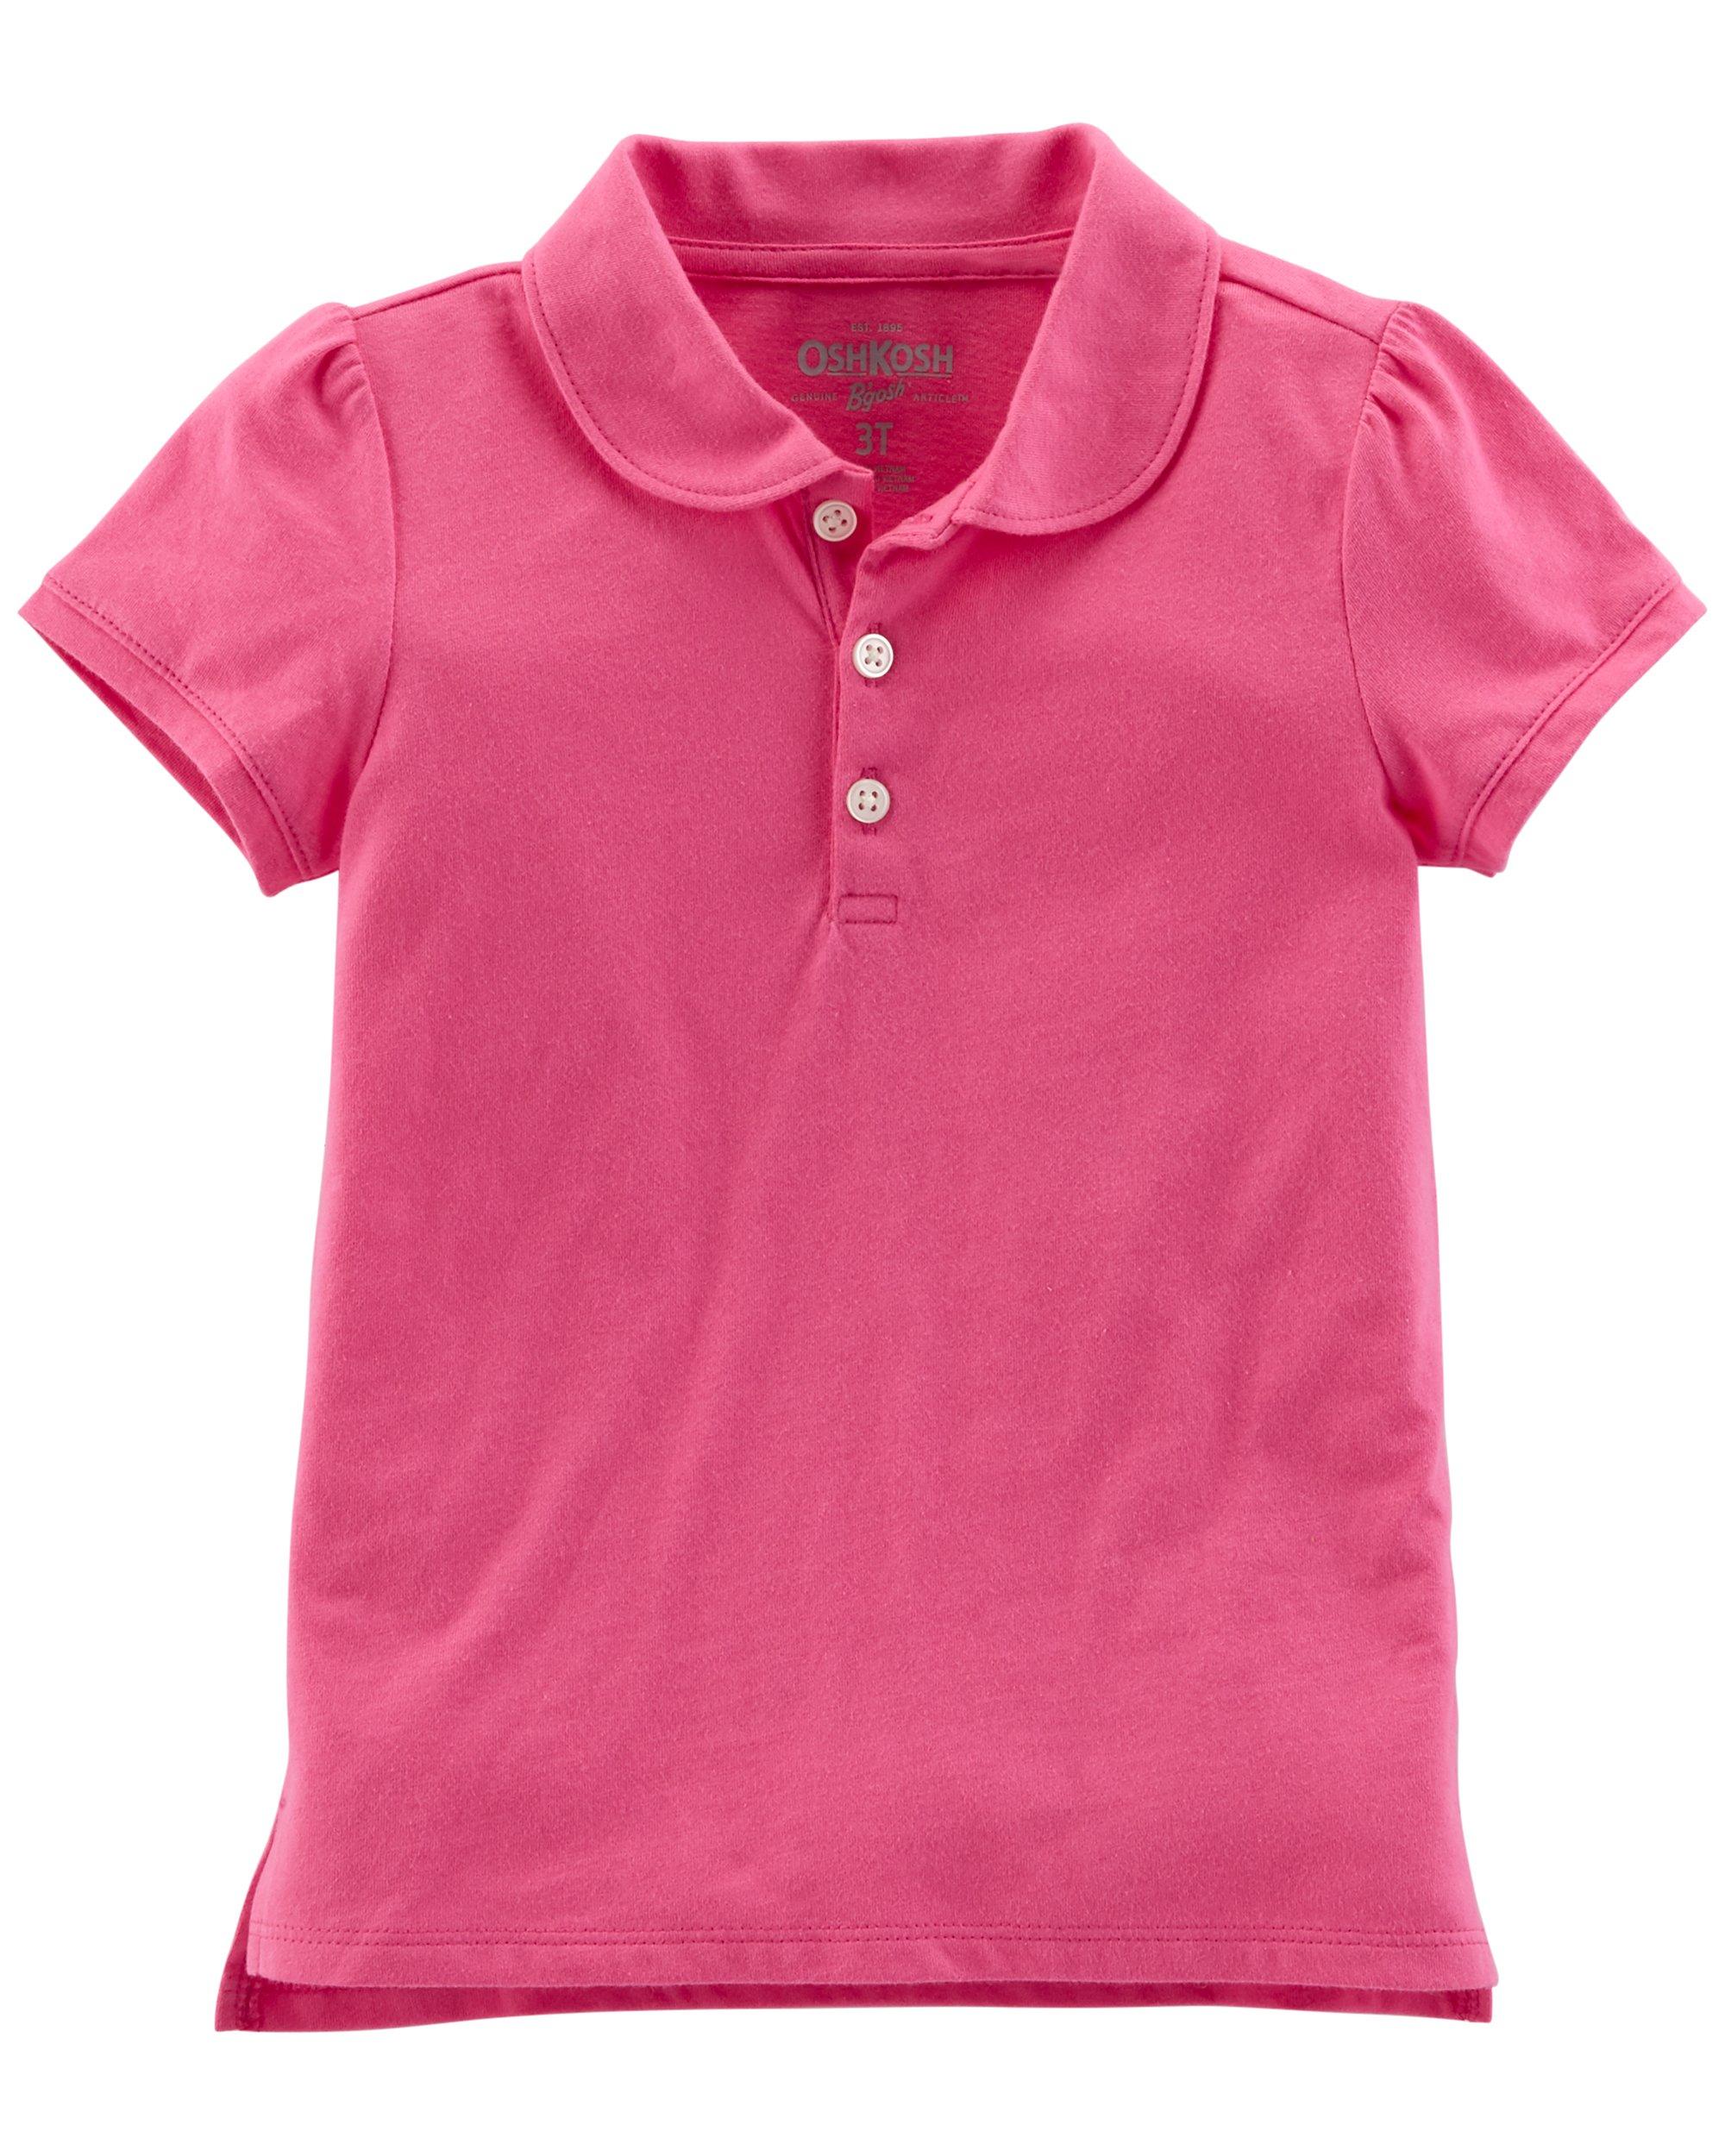 Osh Kosh Girls' Short Sleeve Uniform Polo, Bright Pink, 6-6X